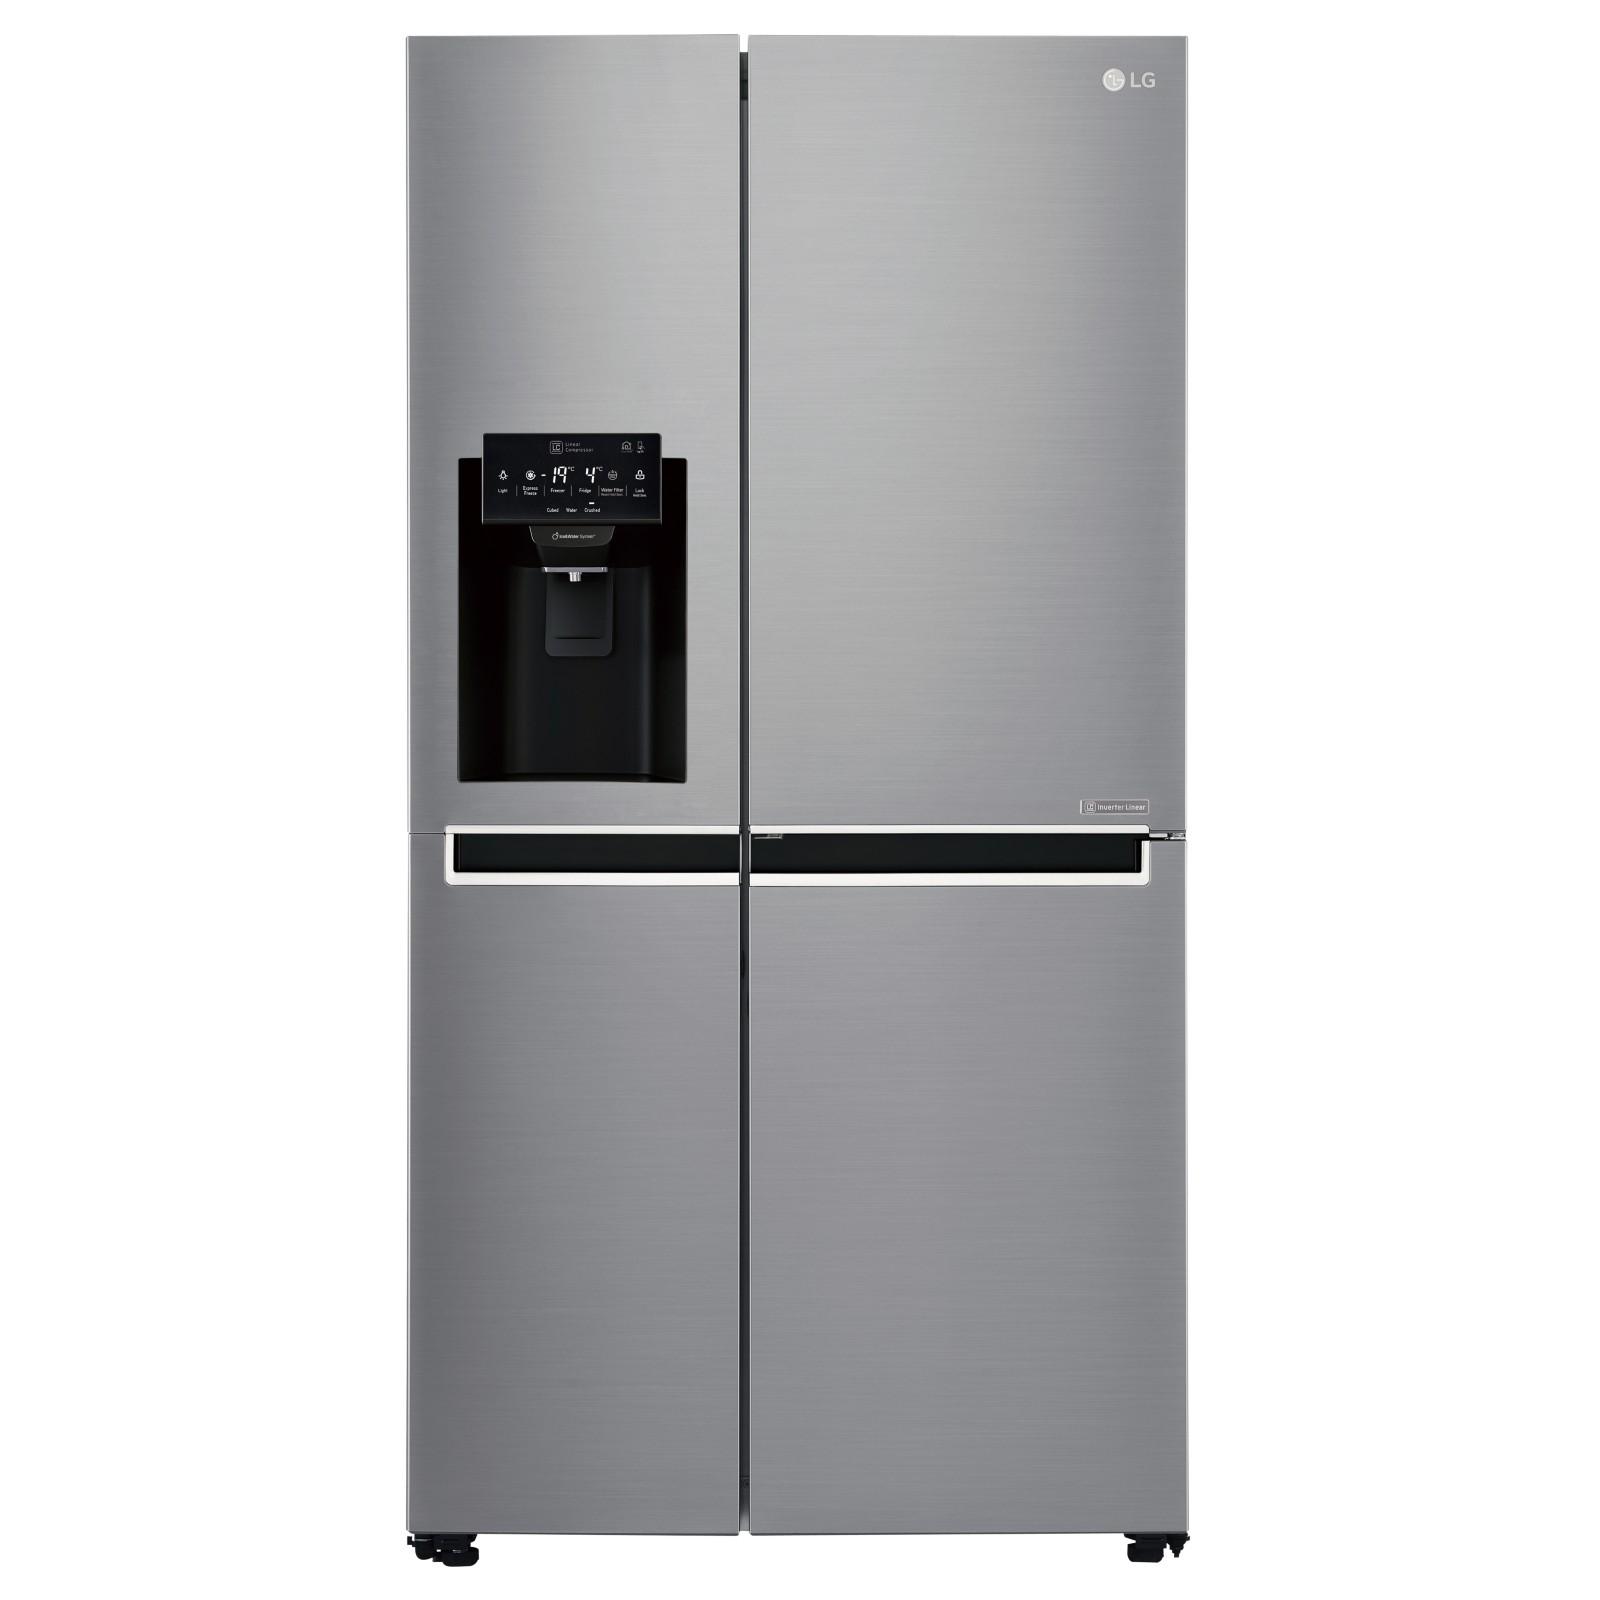 LG GSL760PZXV American Style Fridge Freezer